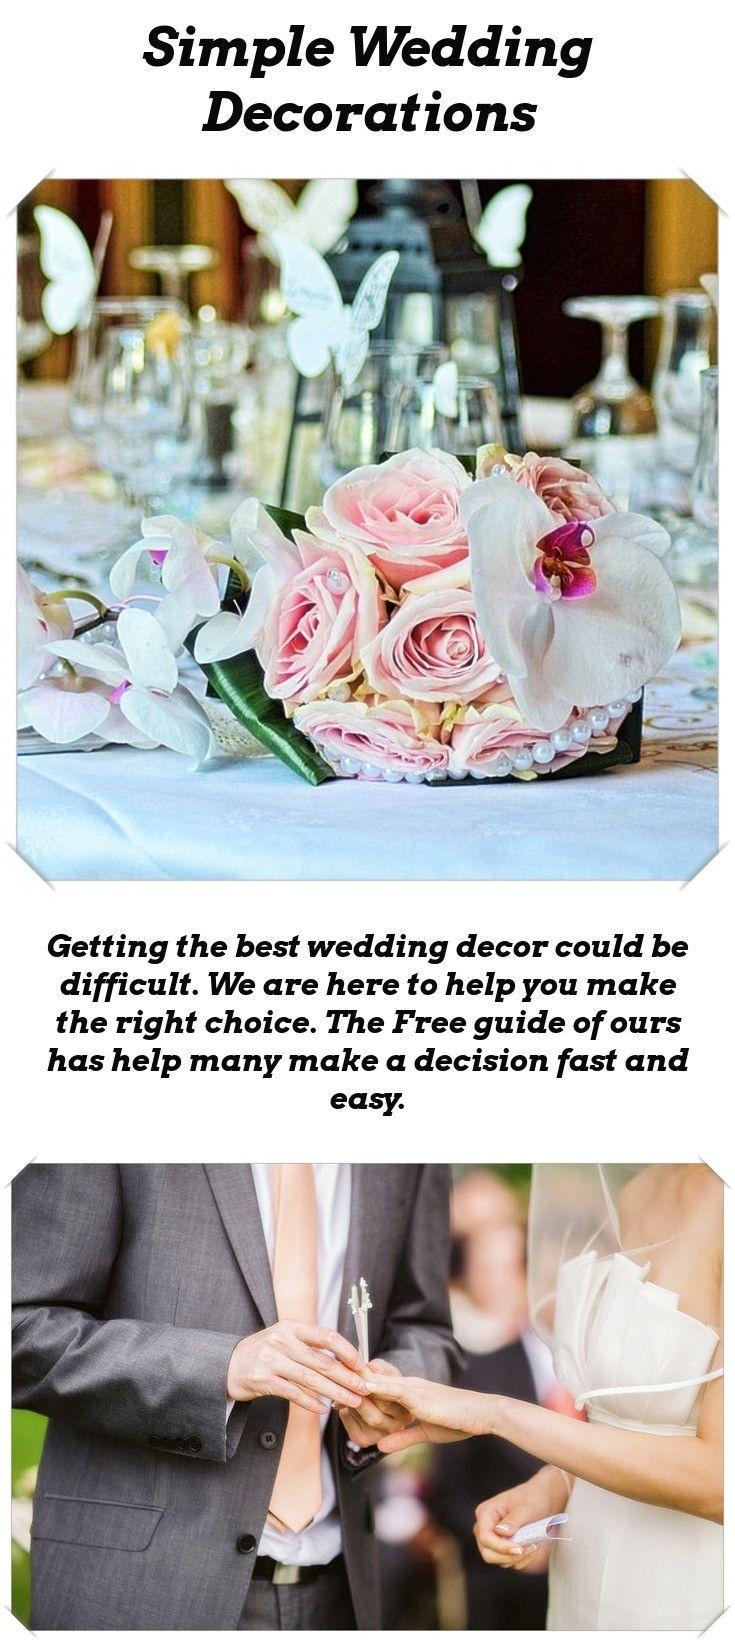 Simple wedding decoration designs  Decoration Ideas For Your Wedding  Wedding Decor Inspiration